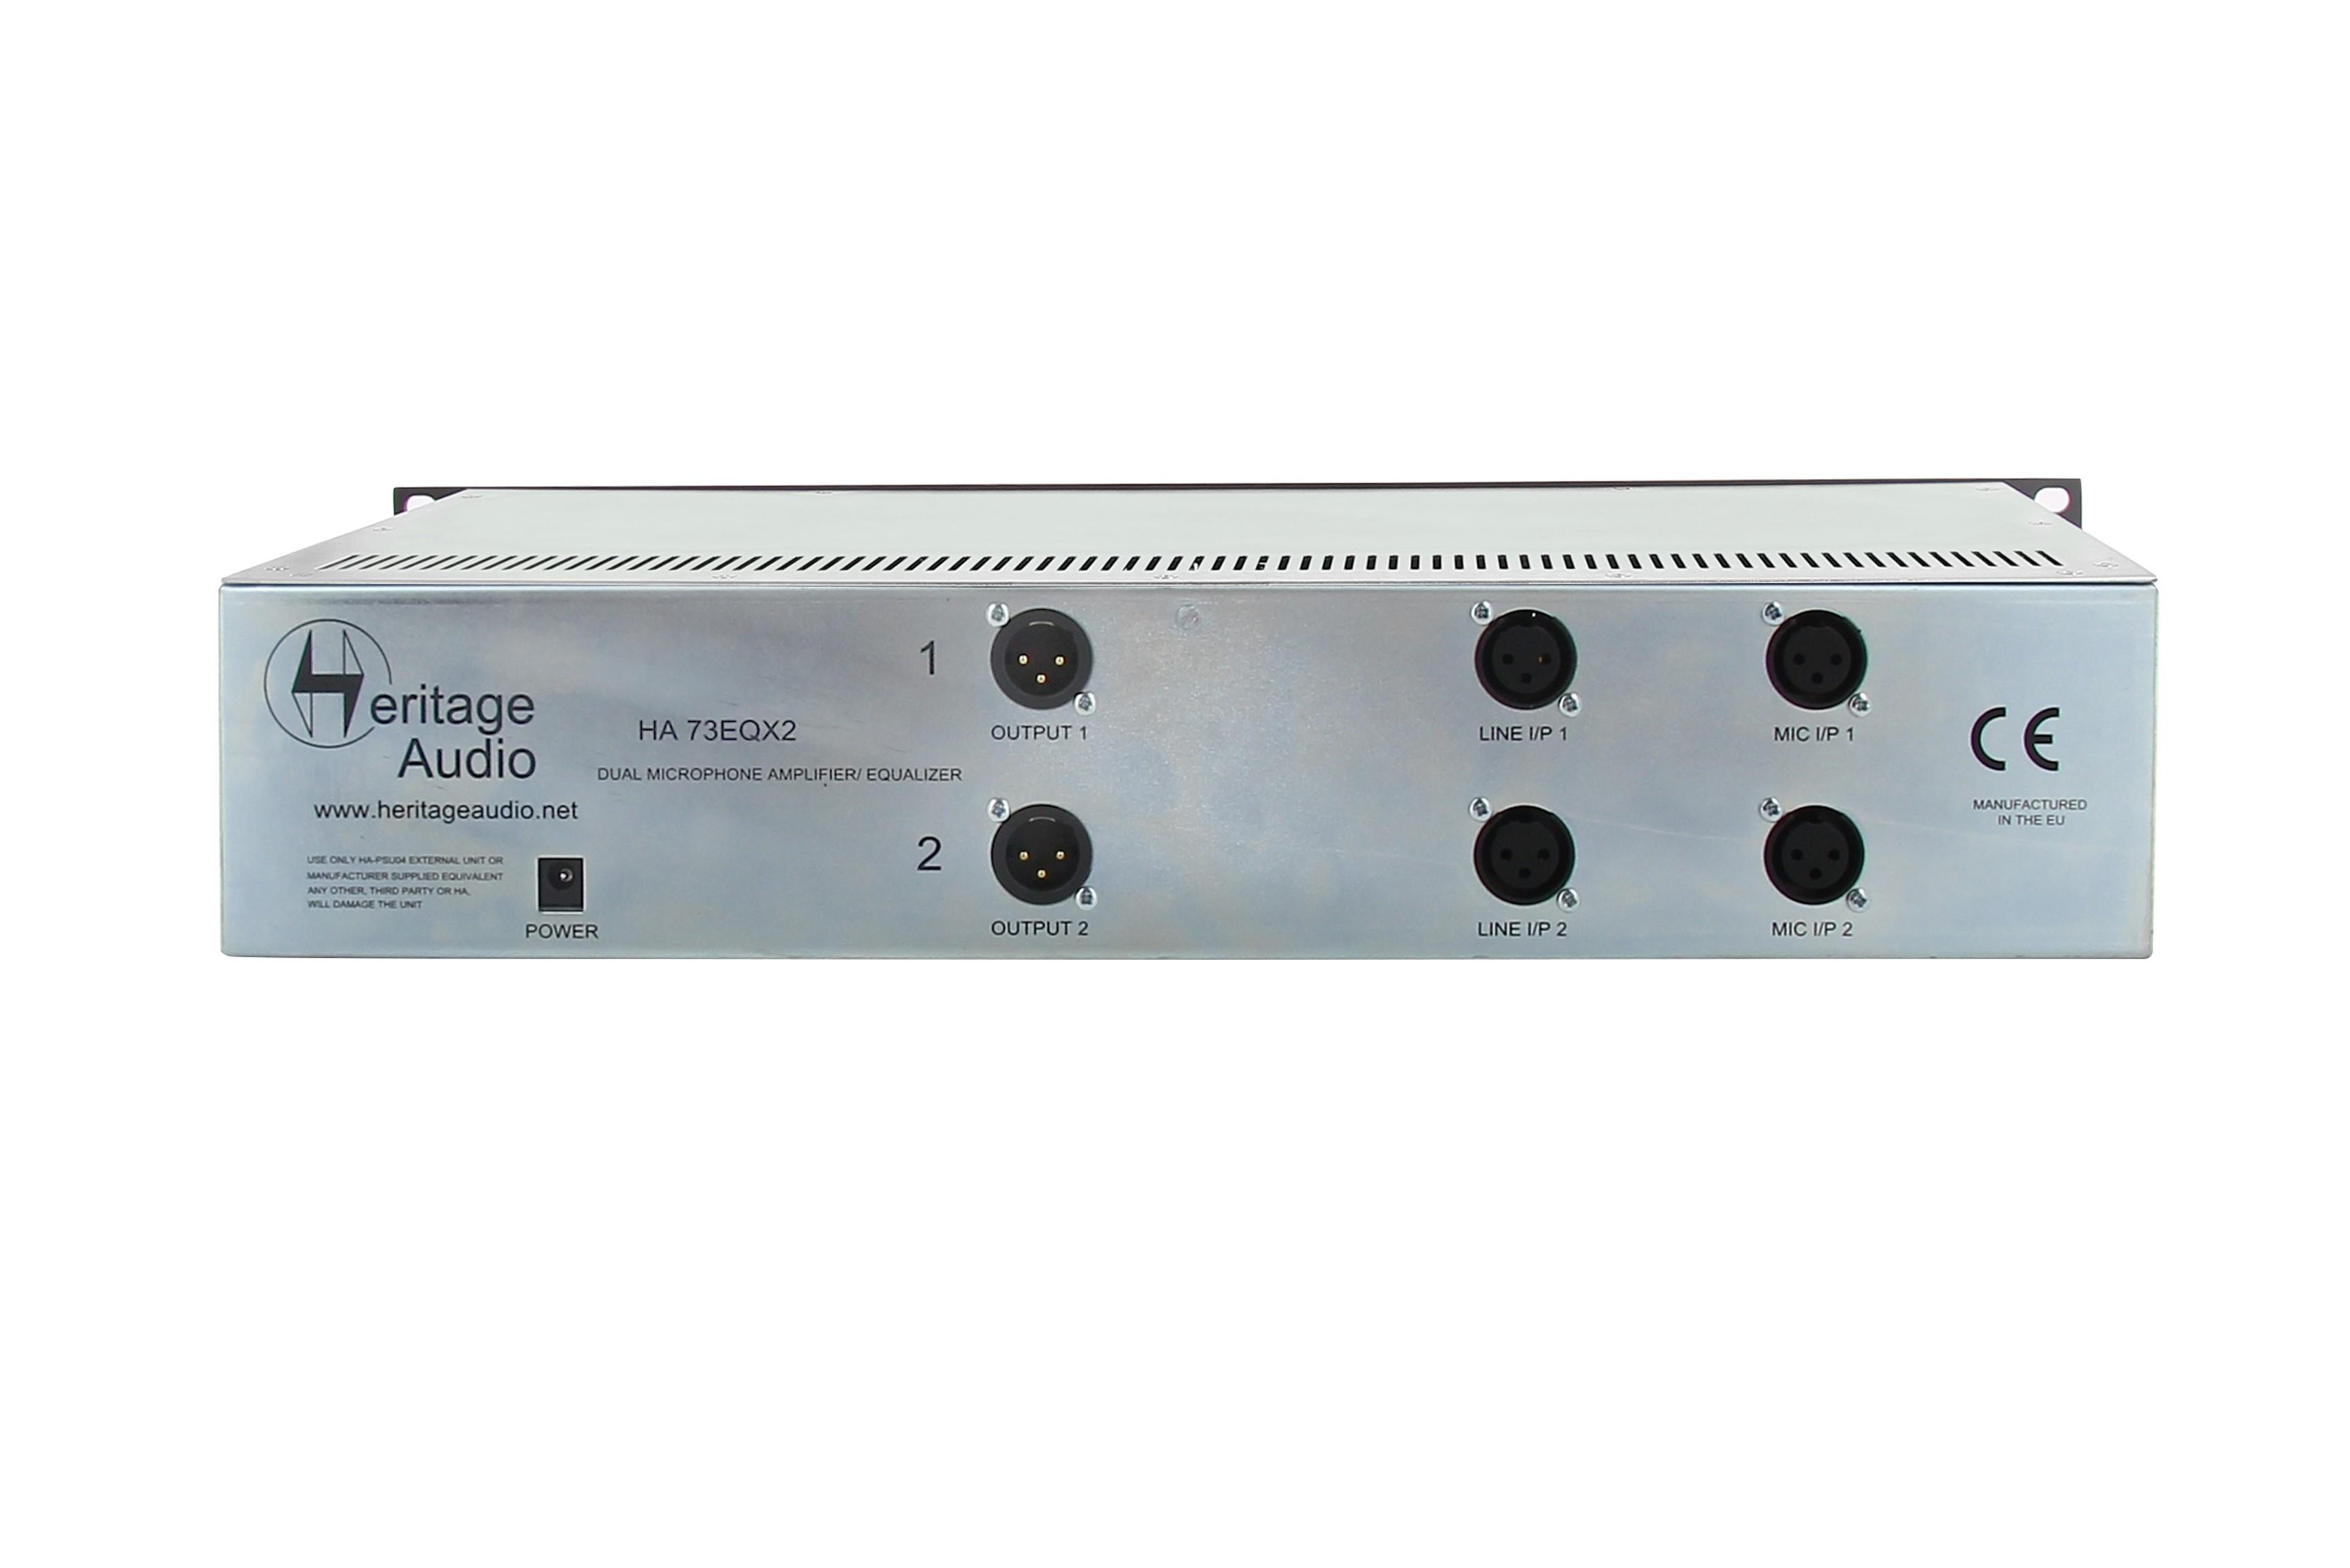 Heritage_Audio_HA73_equalizer_Elite-2.jpg